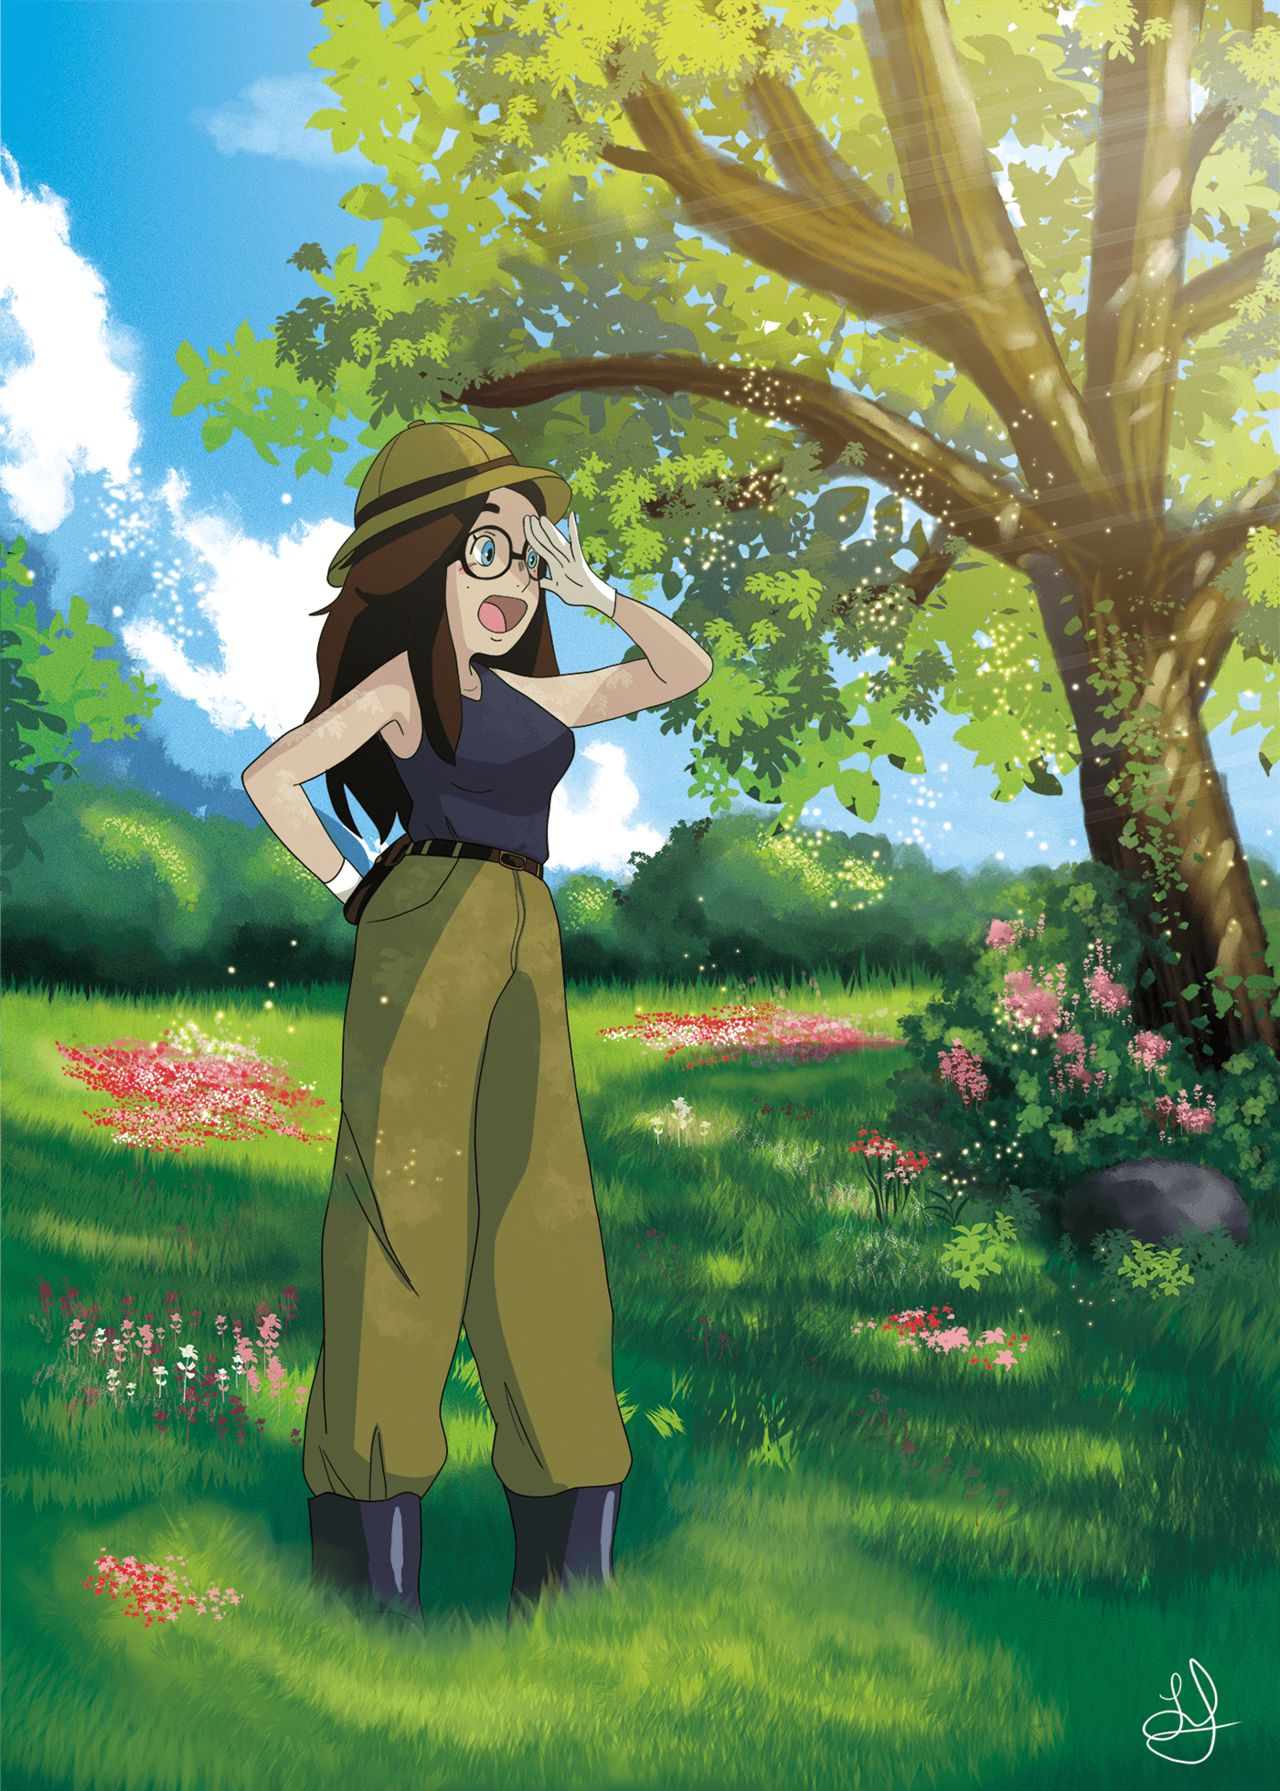 Illustration - Archéologue Ghibli